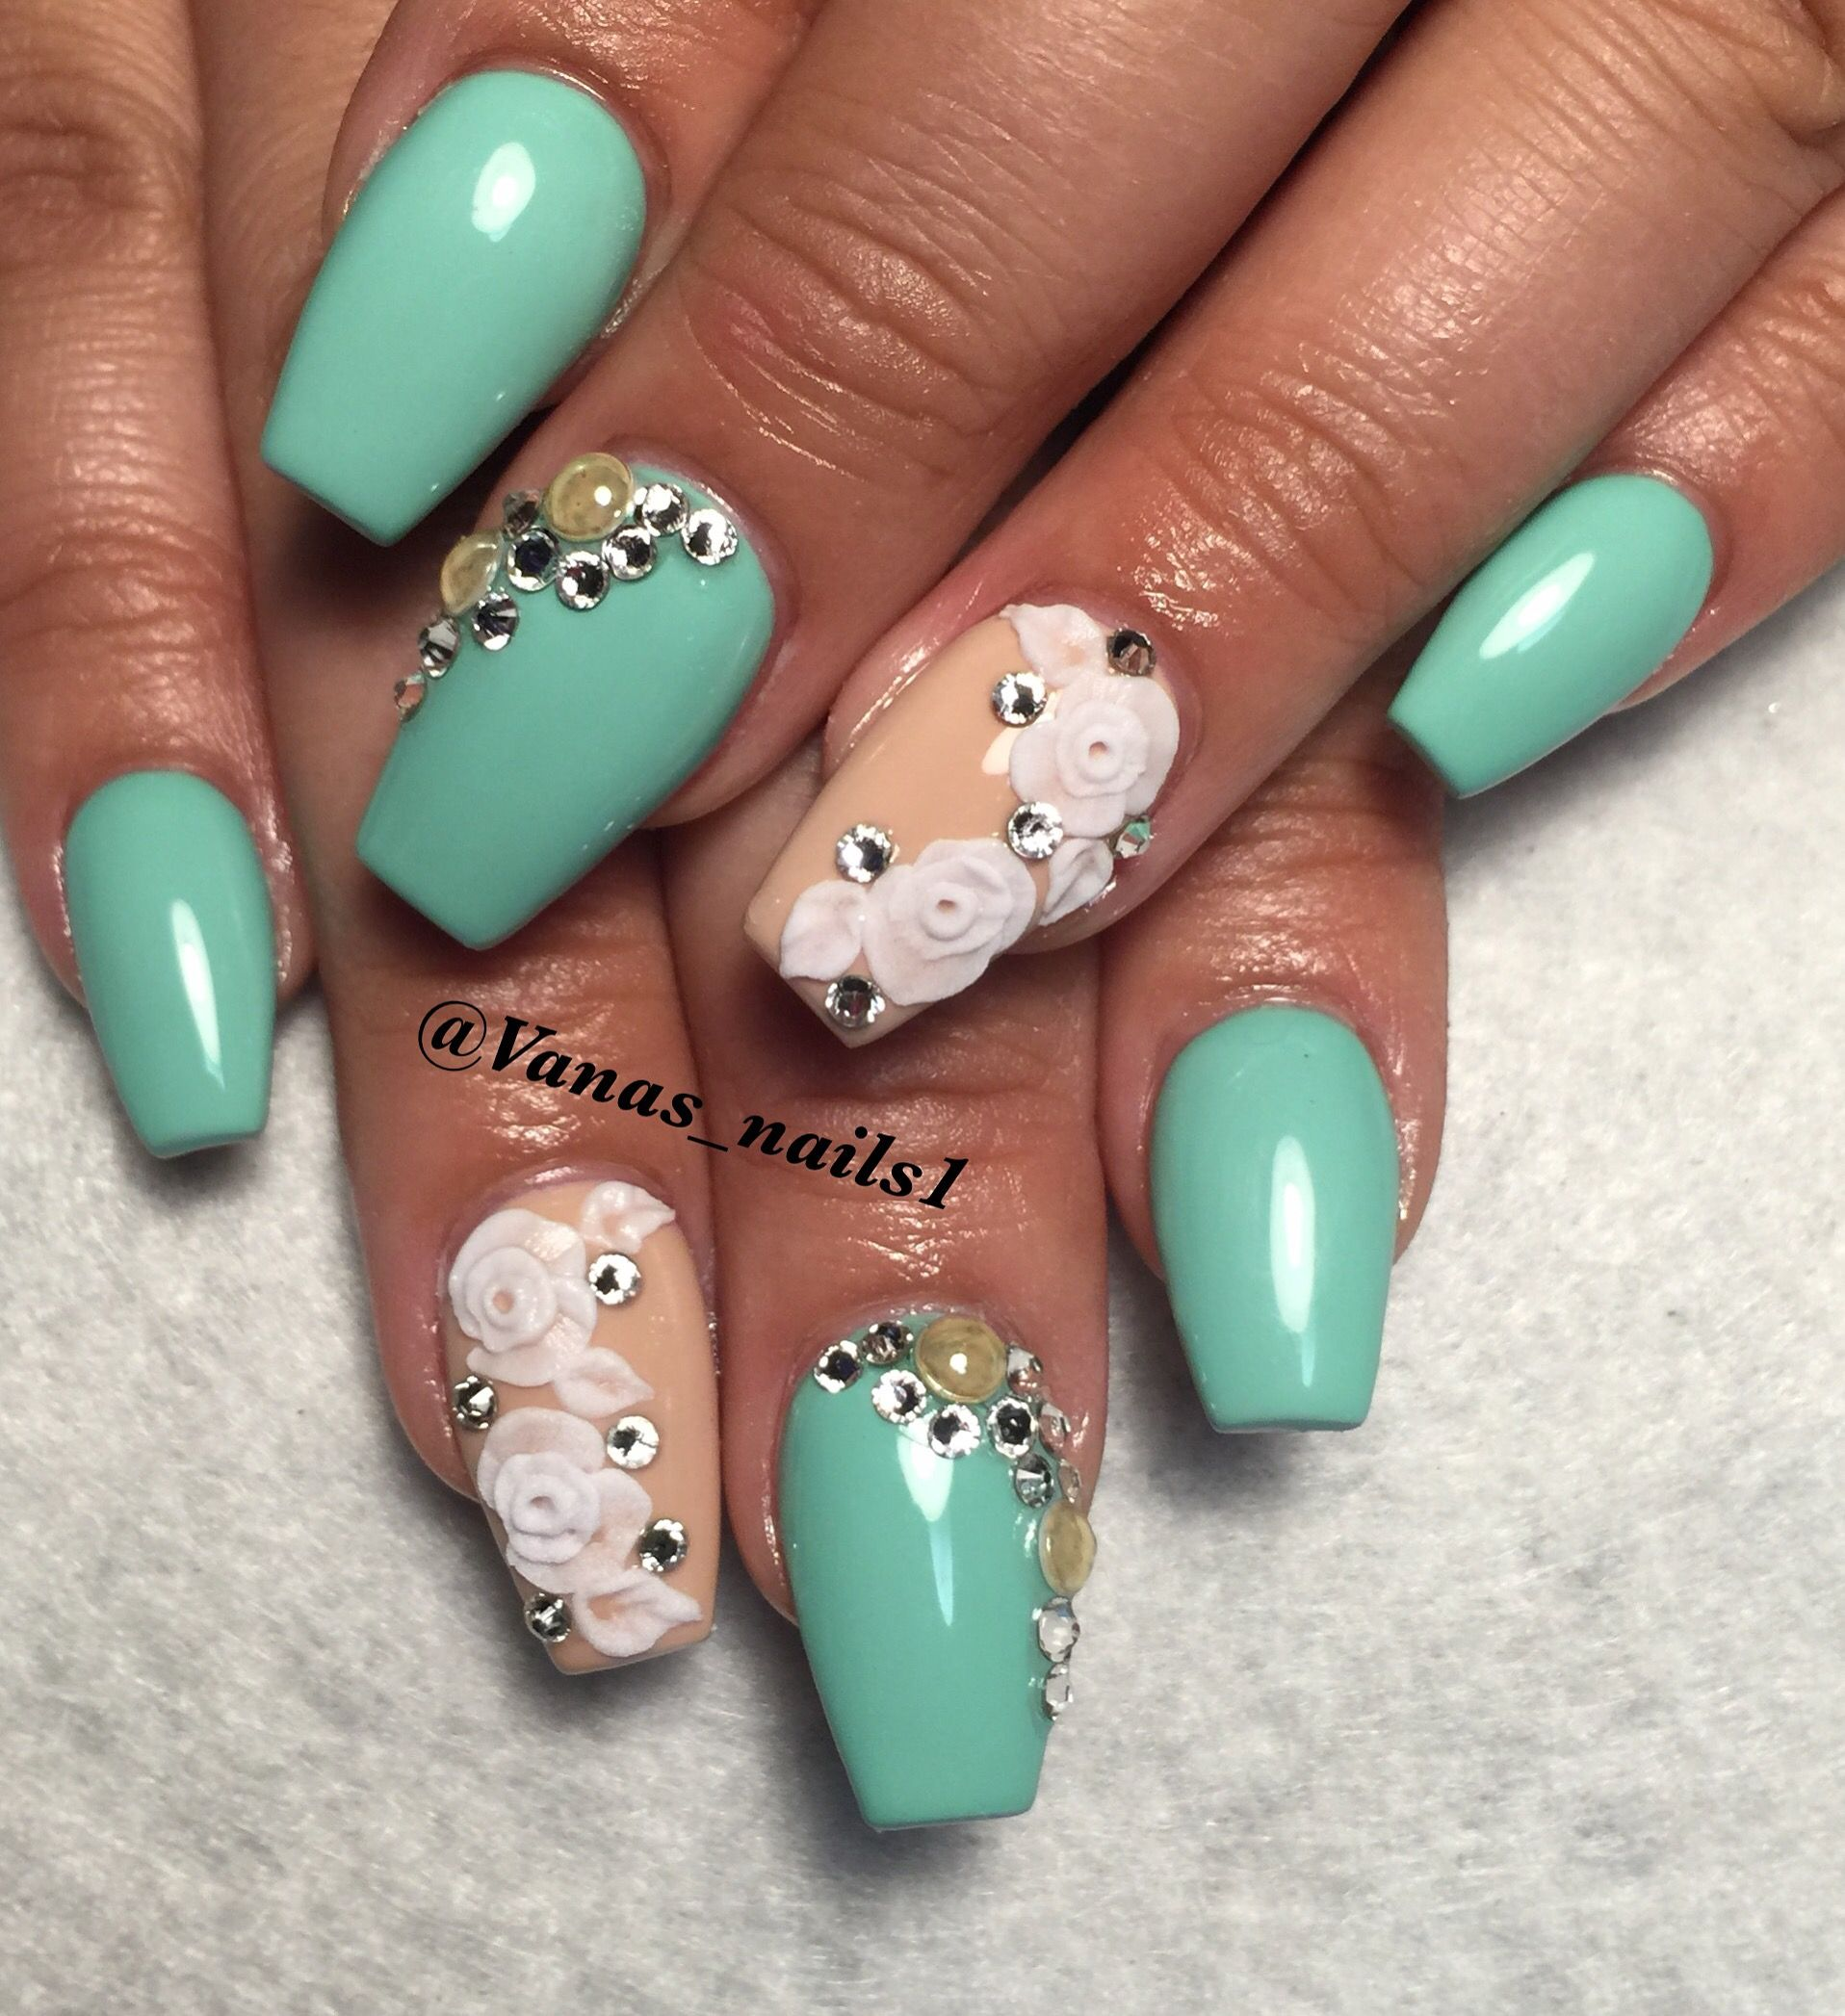 Coffin nail art design 3d flowers mint vanas nails pinterest coffin nail art design 3d flowers mint prinsesfo Choice Image